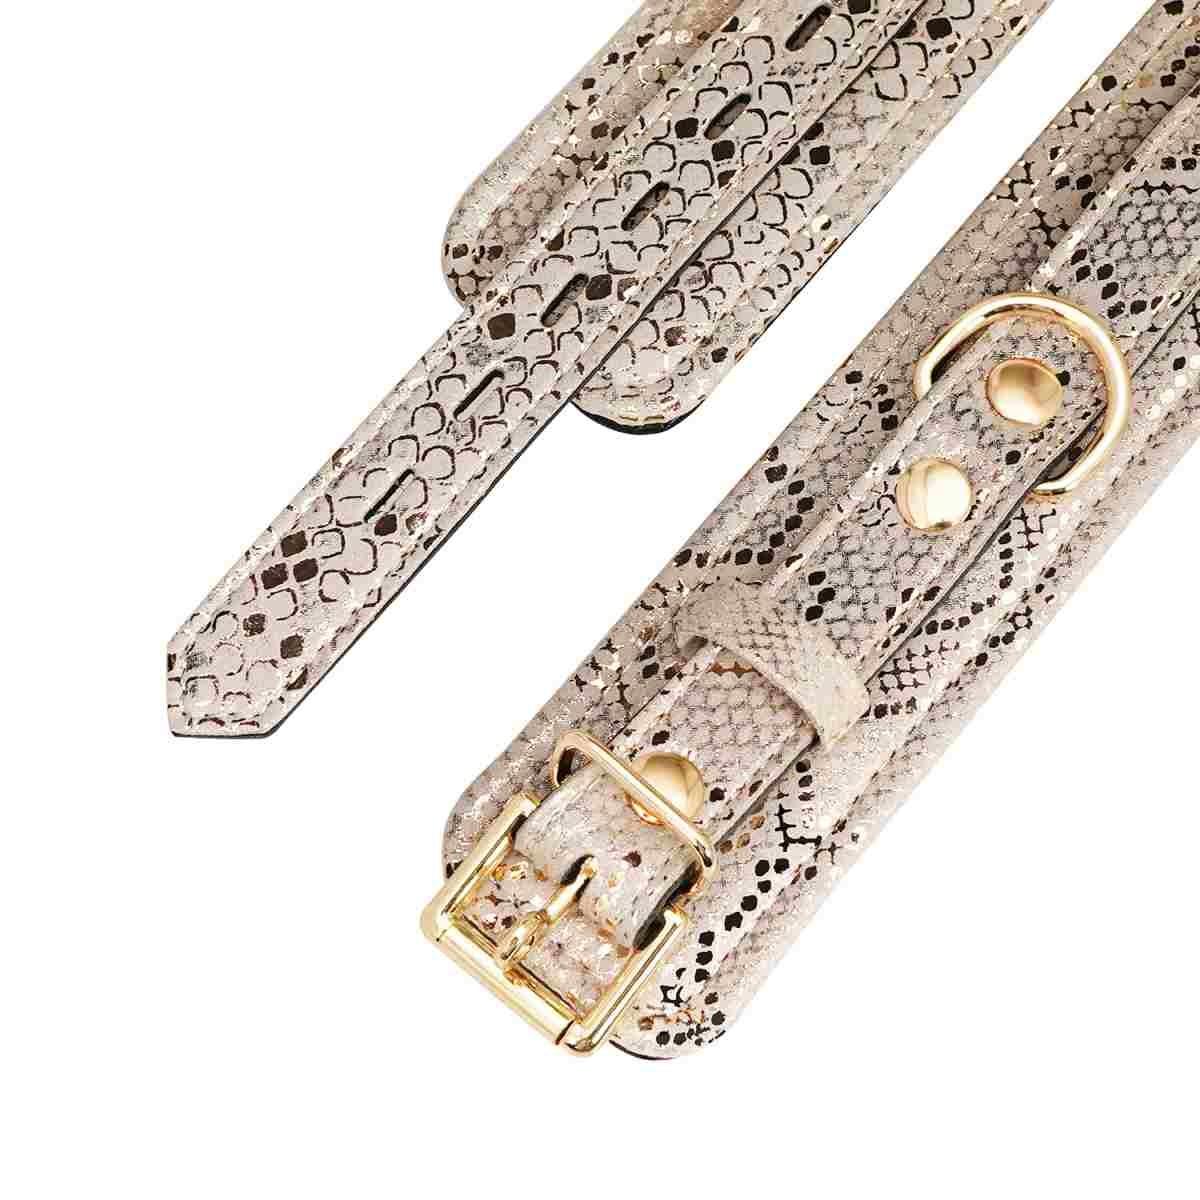 Microfiber Snake Print Ankle Cuffs